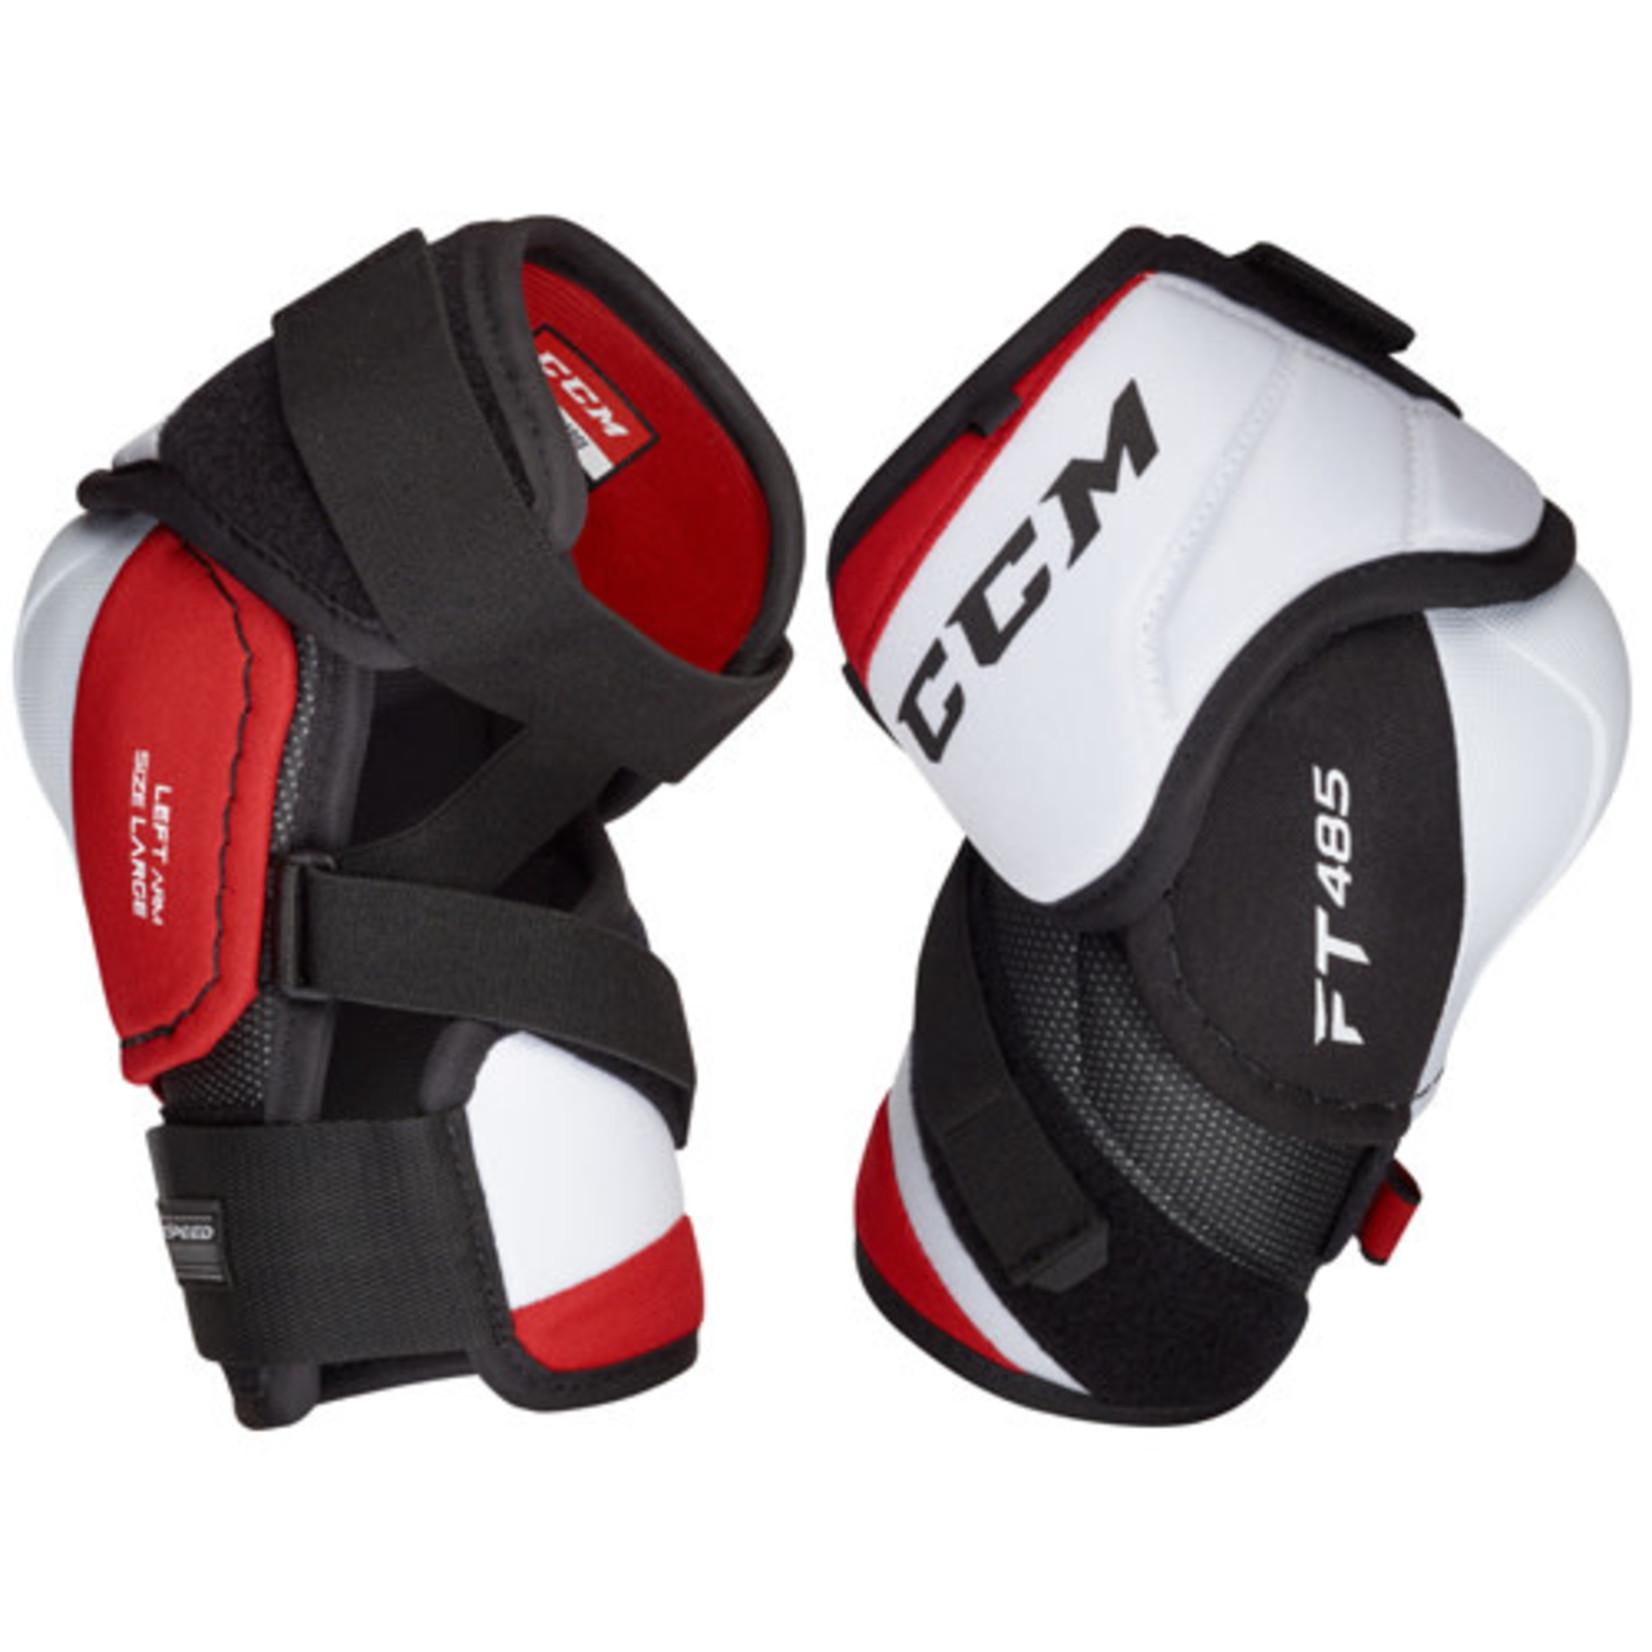 CCM CCM Hockey Elbow Pads, Jetspeed FT485, Junior